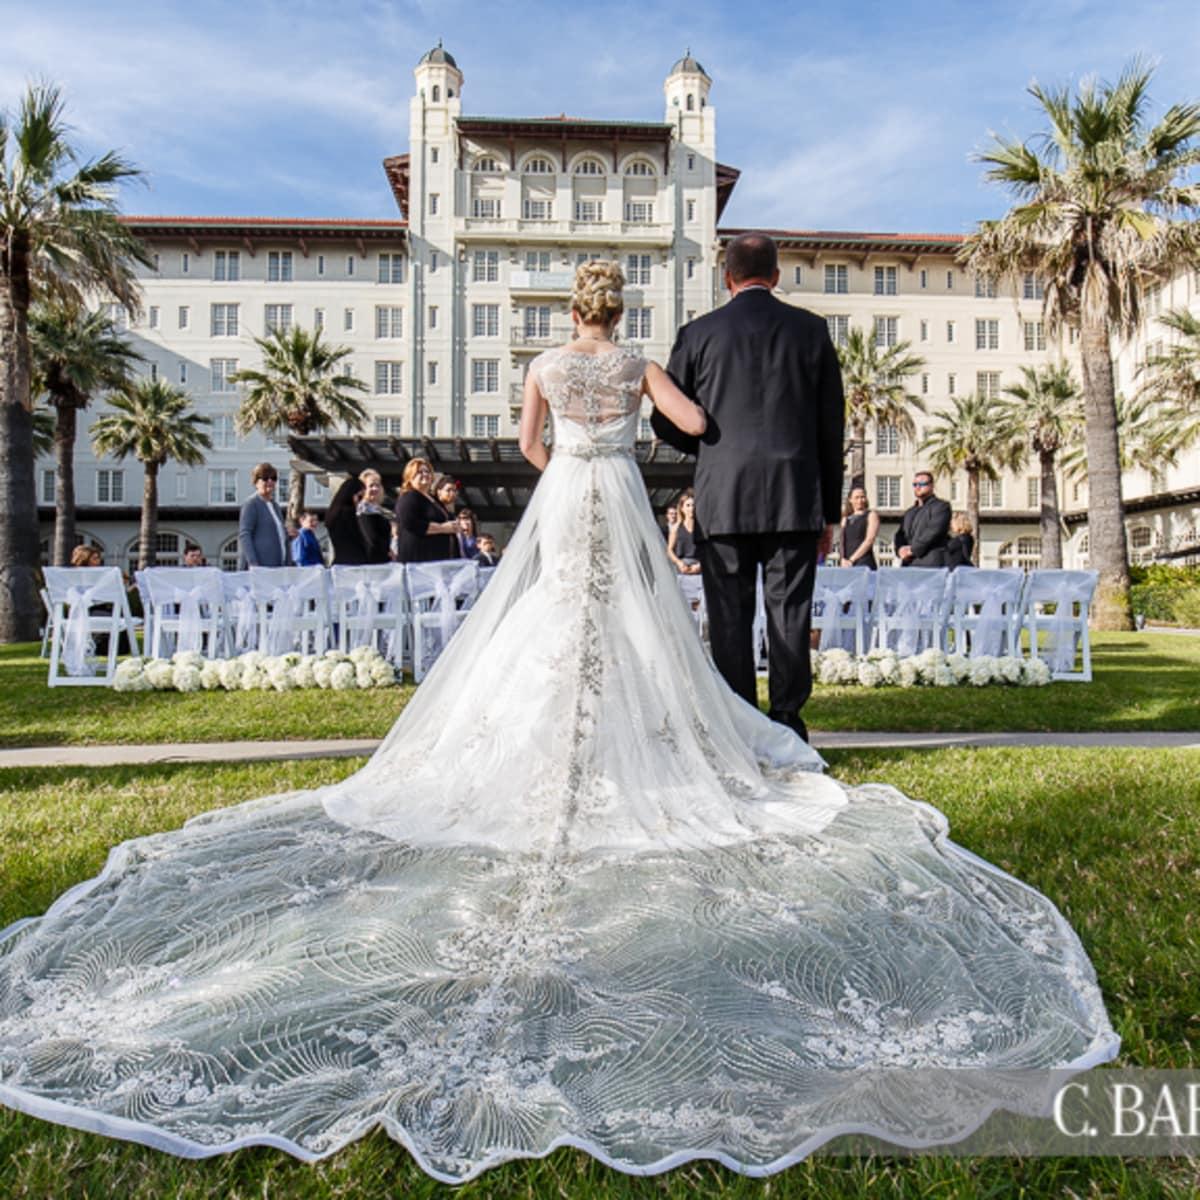 Hotel Galvez Lawn Center wedding